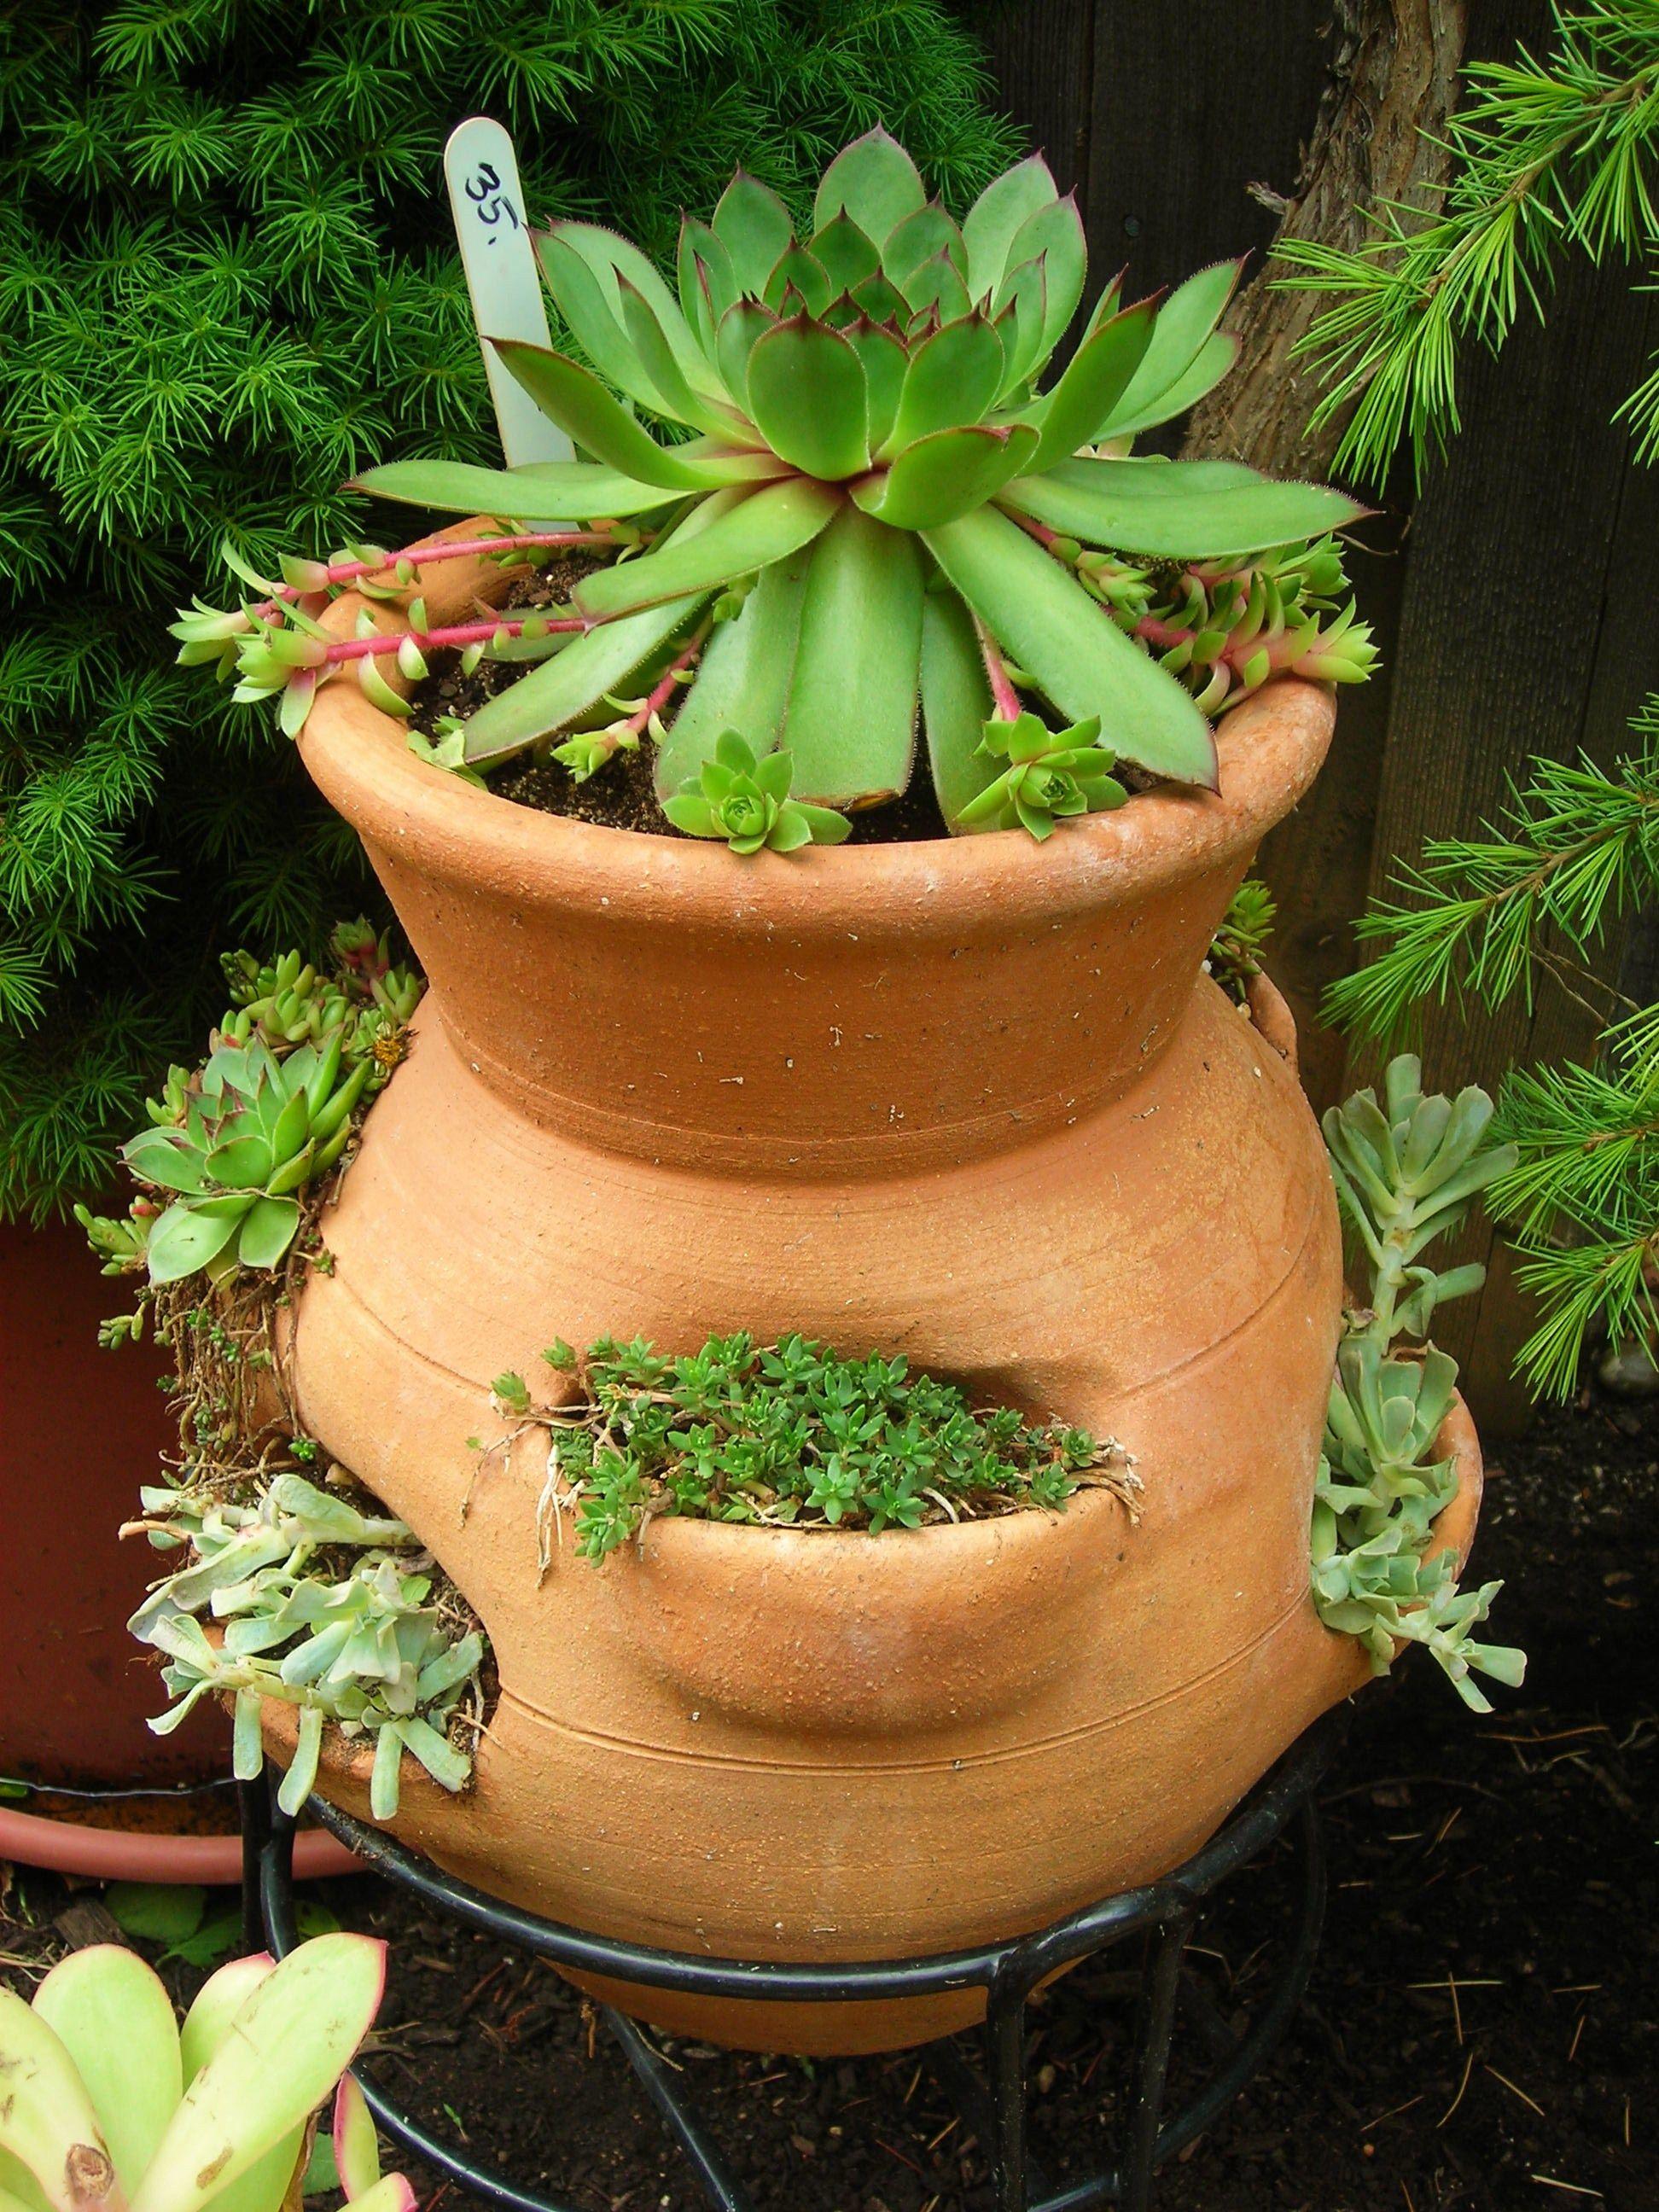 Try A Sedum Garden In A Strawberry Pot Sedum Garden Strawberry Pots Sedum